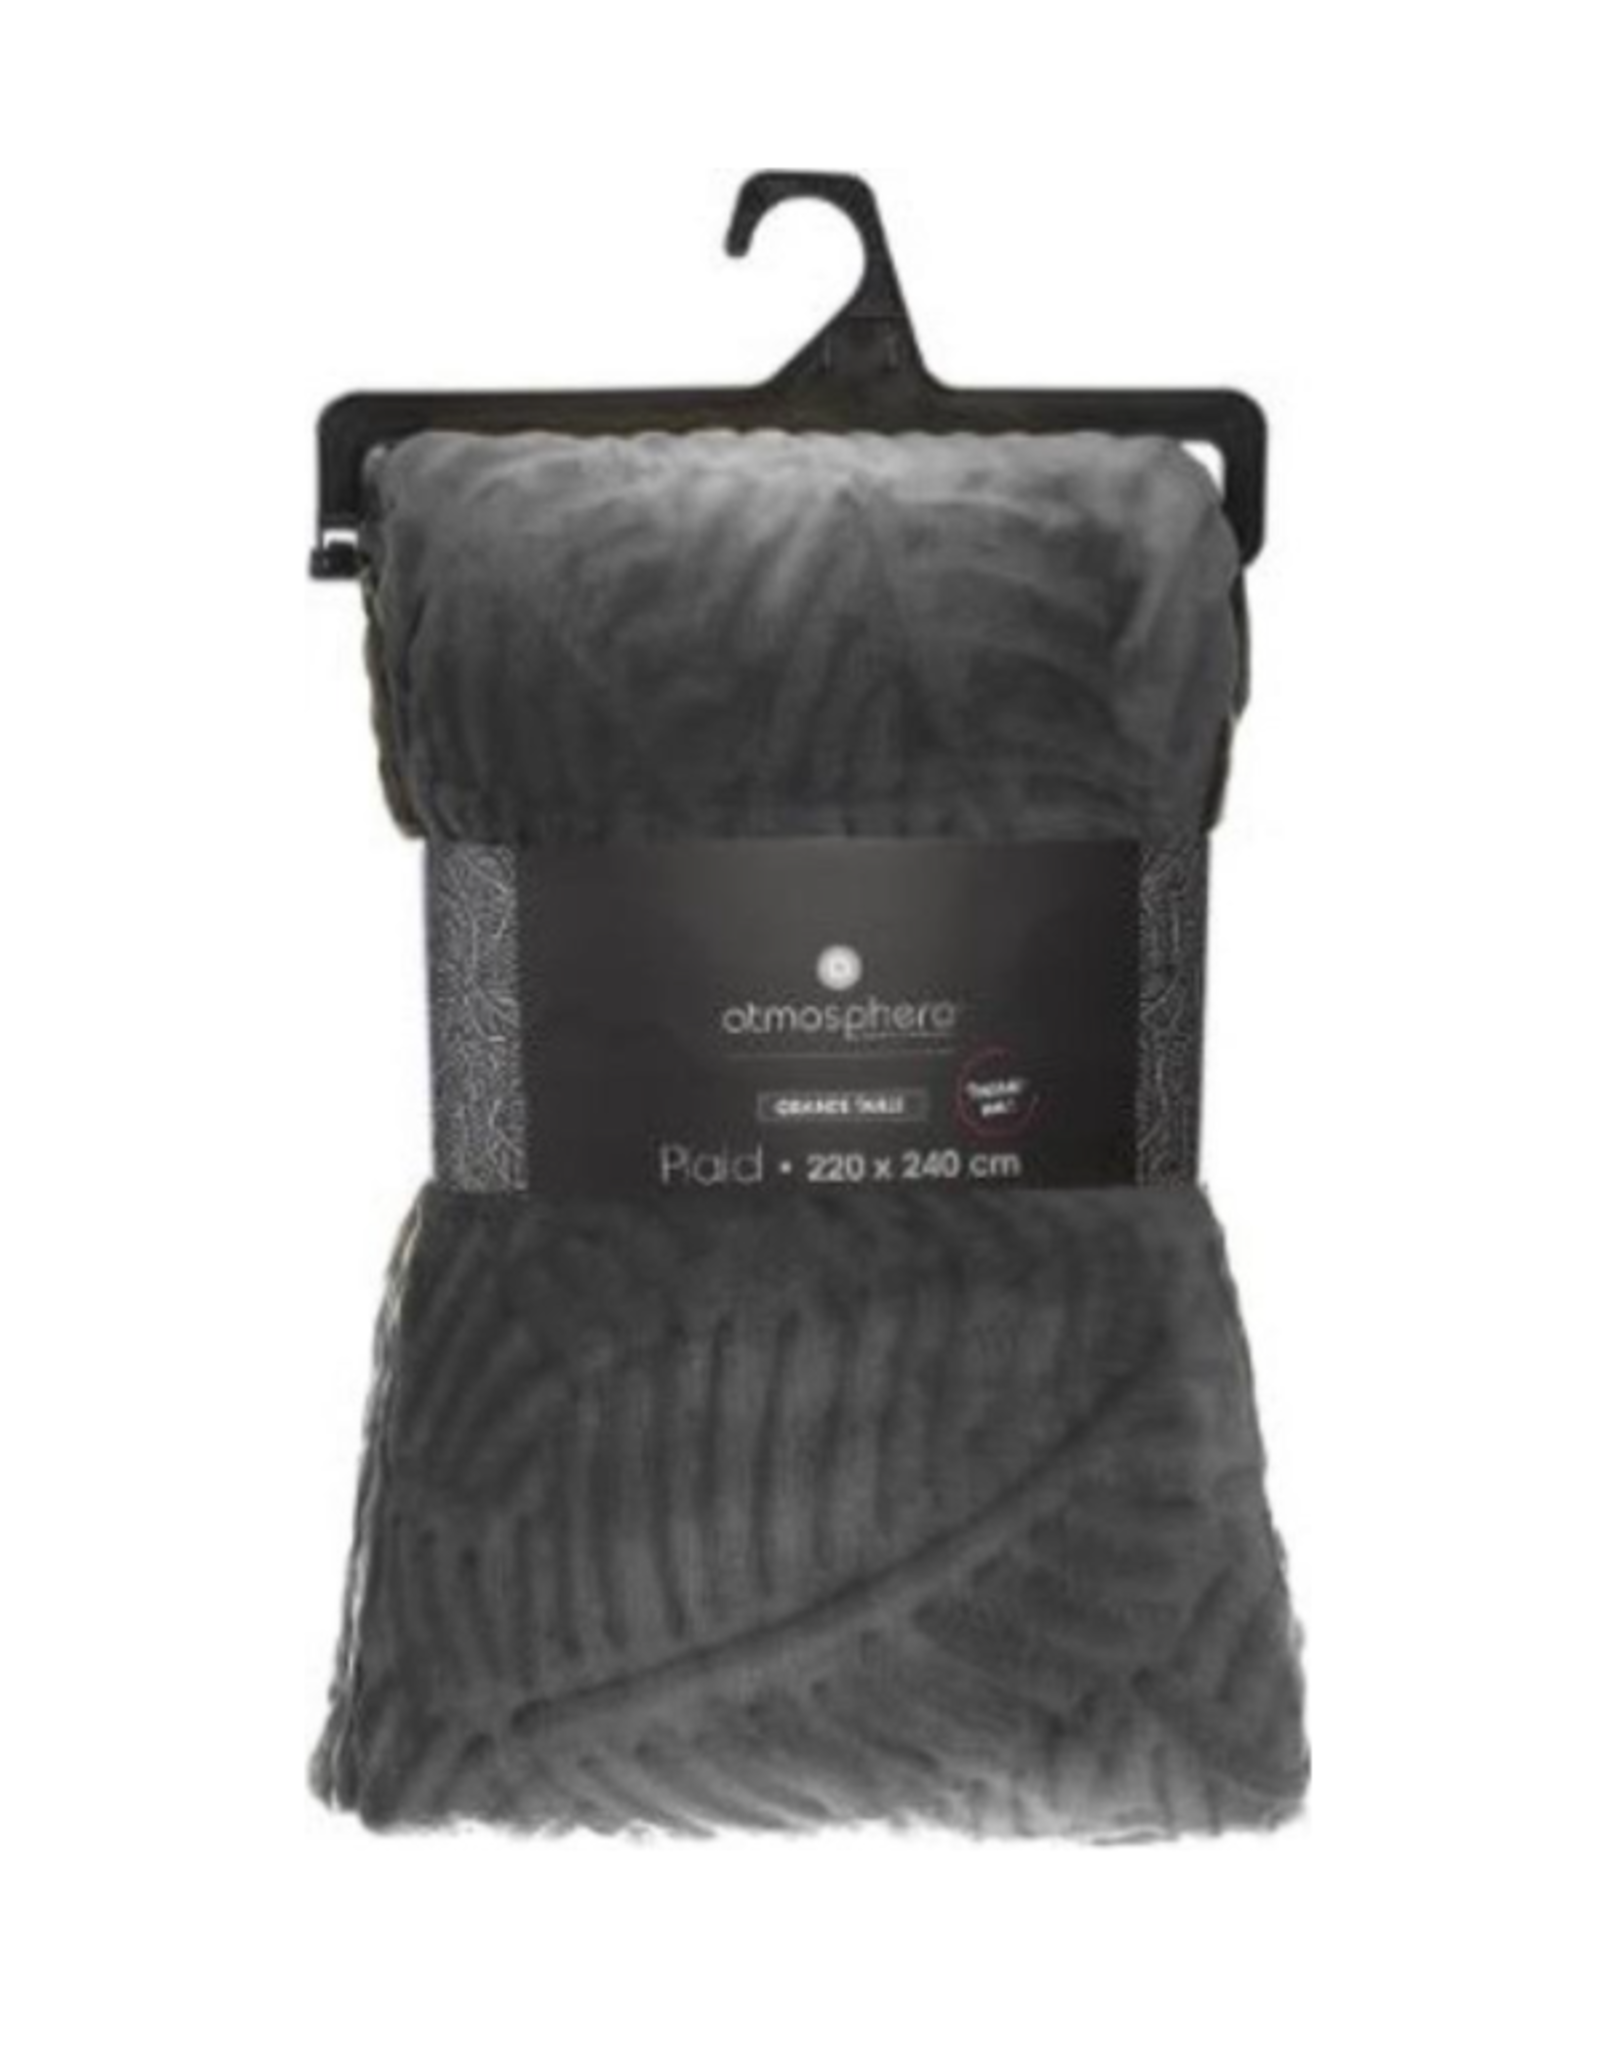 Atmosphera Plaid | AntracietGrijs | Fleece-plaid met palmblad patroon | Deken | 240x220cm